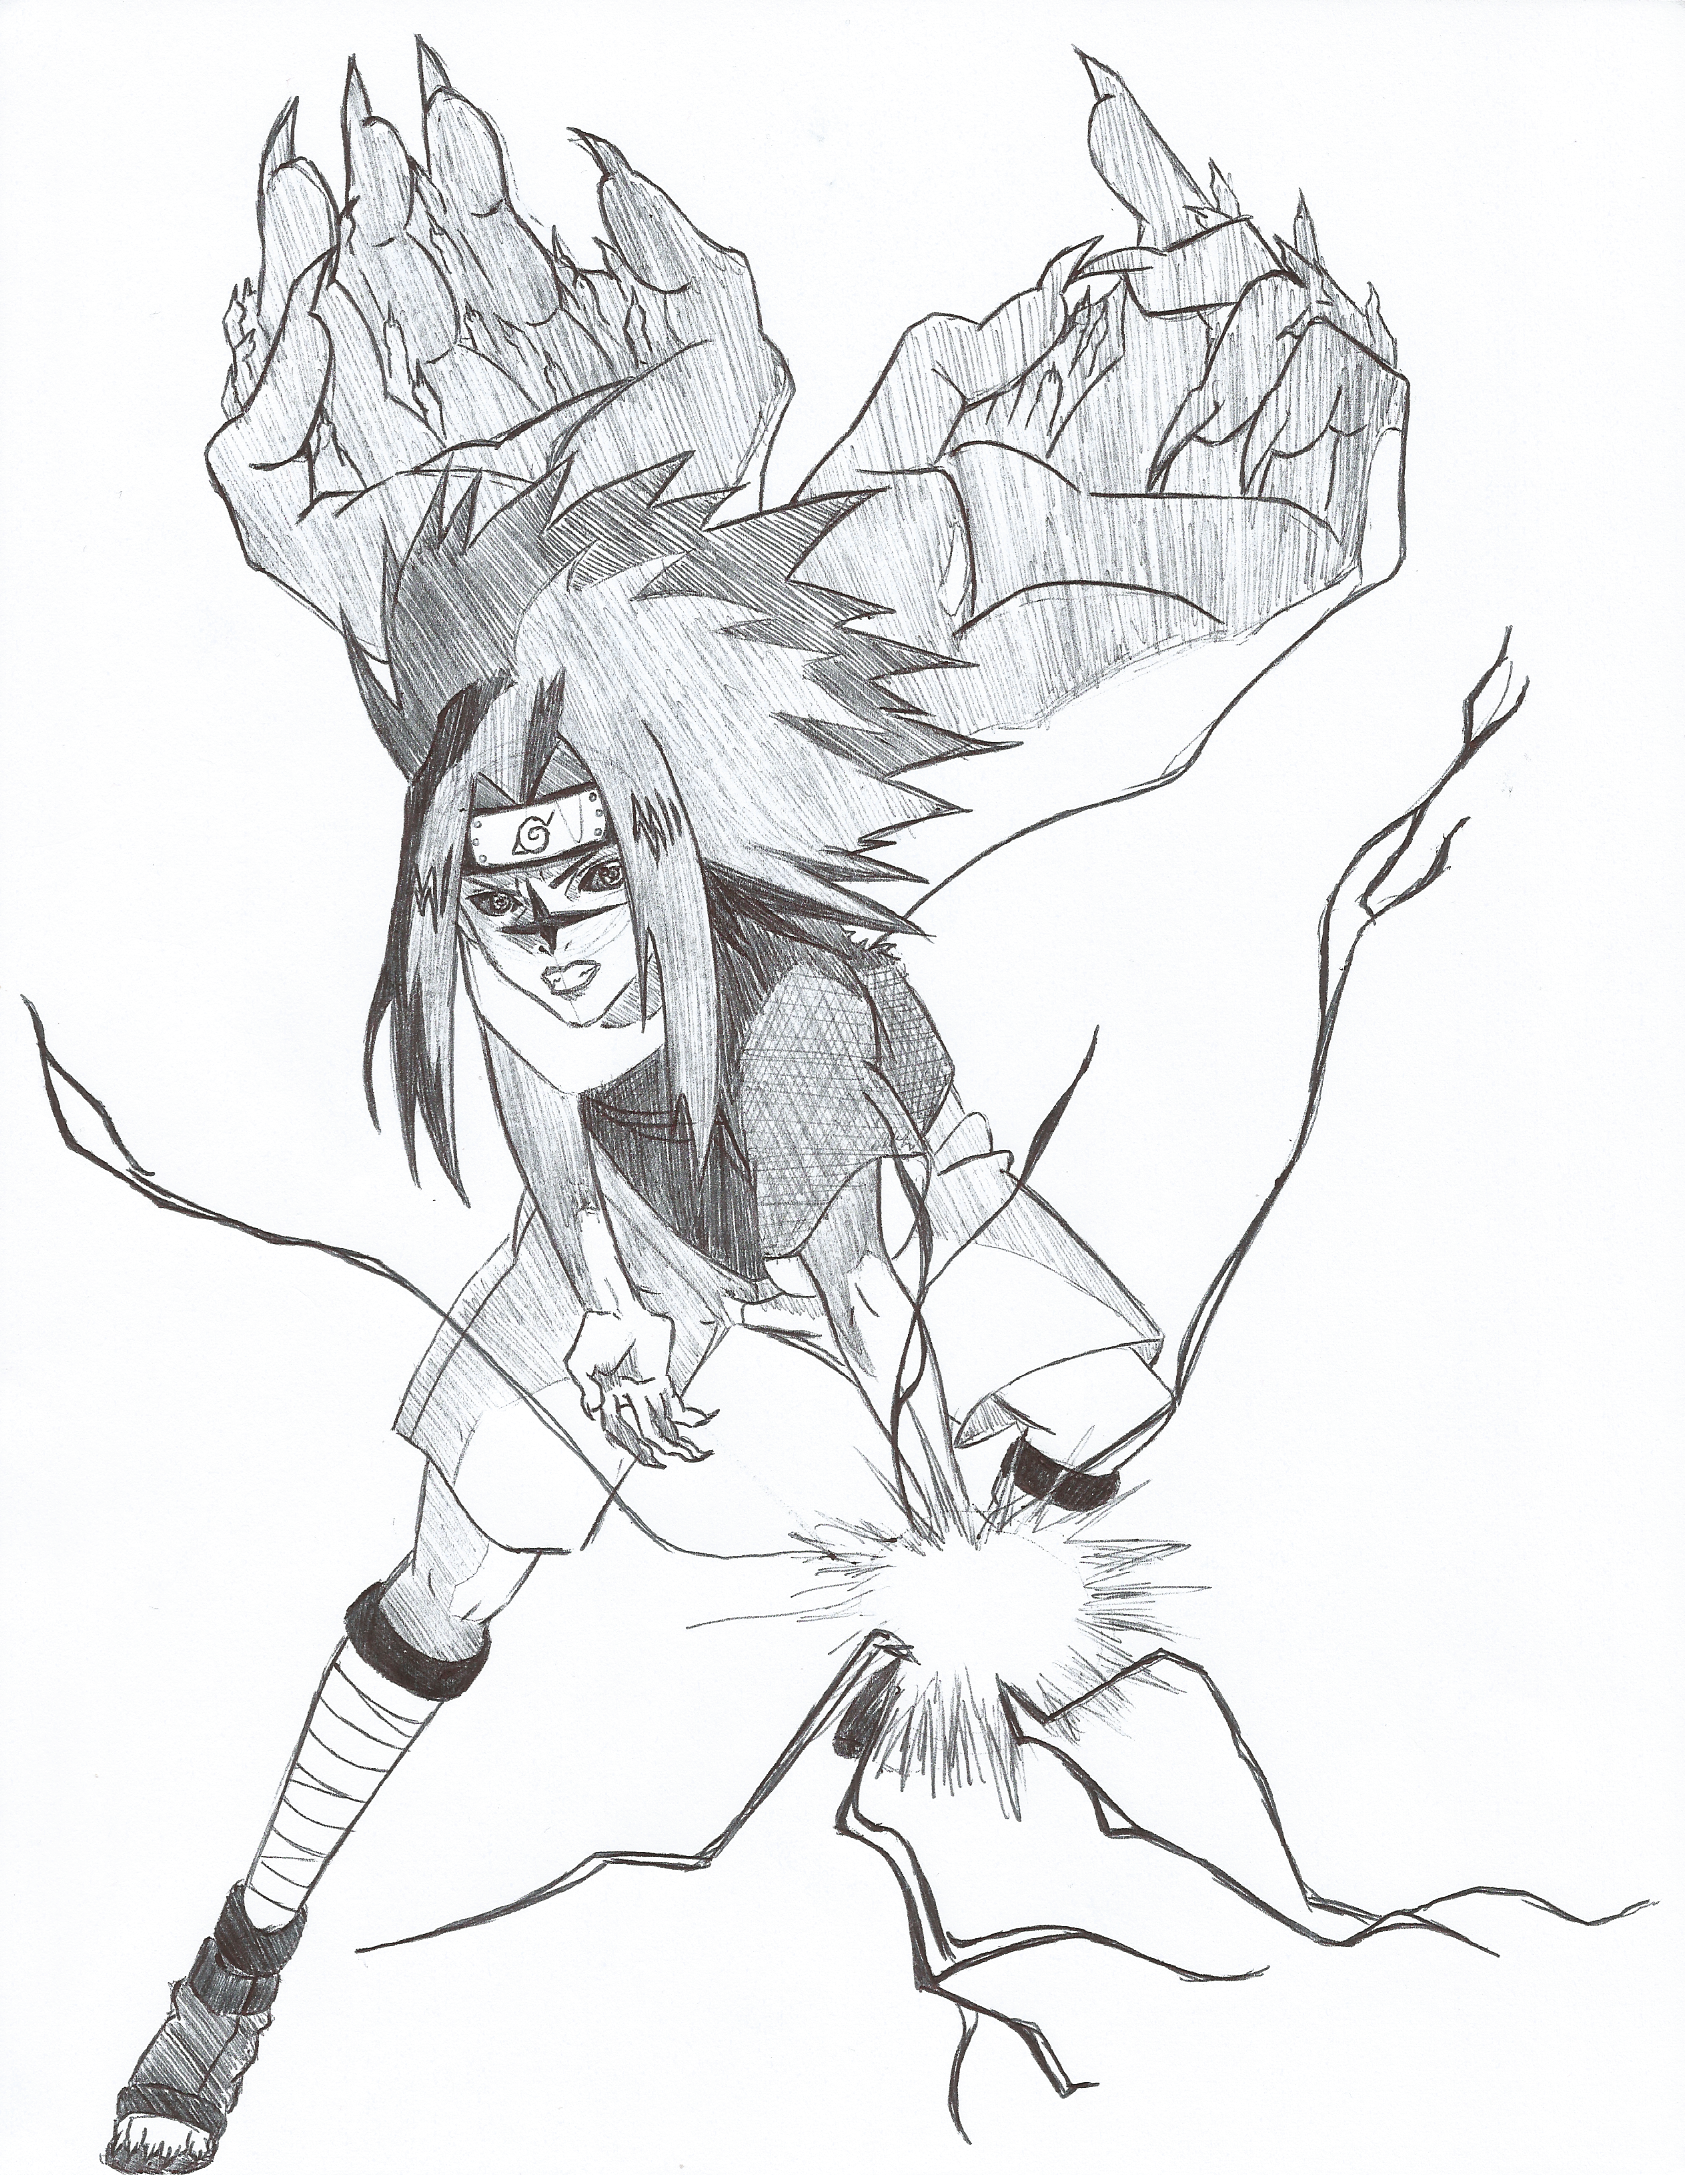 Drawn naruto sasuke chidori drawing Mark DeviantArt 2  Level